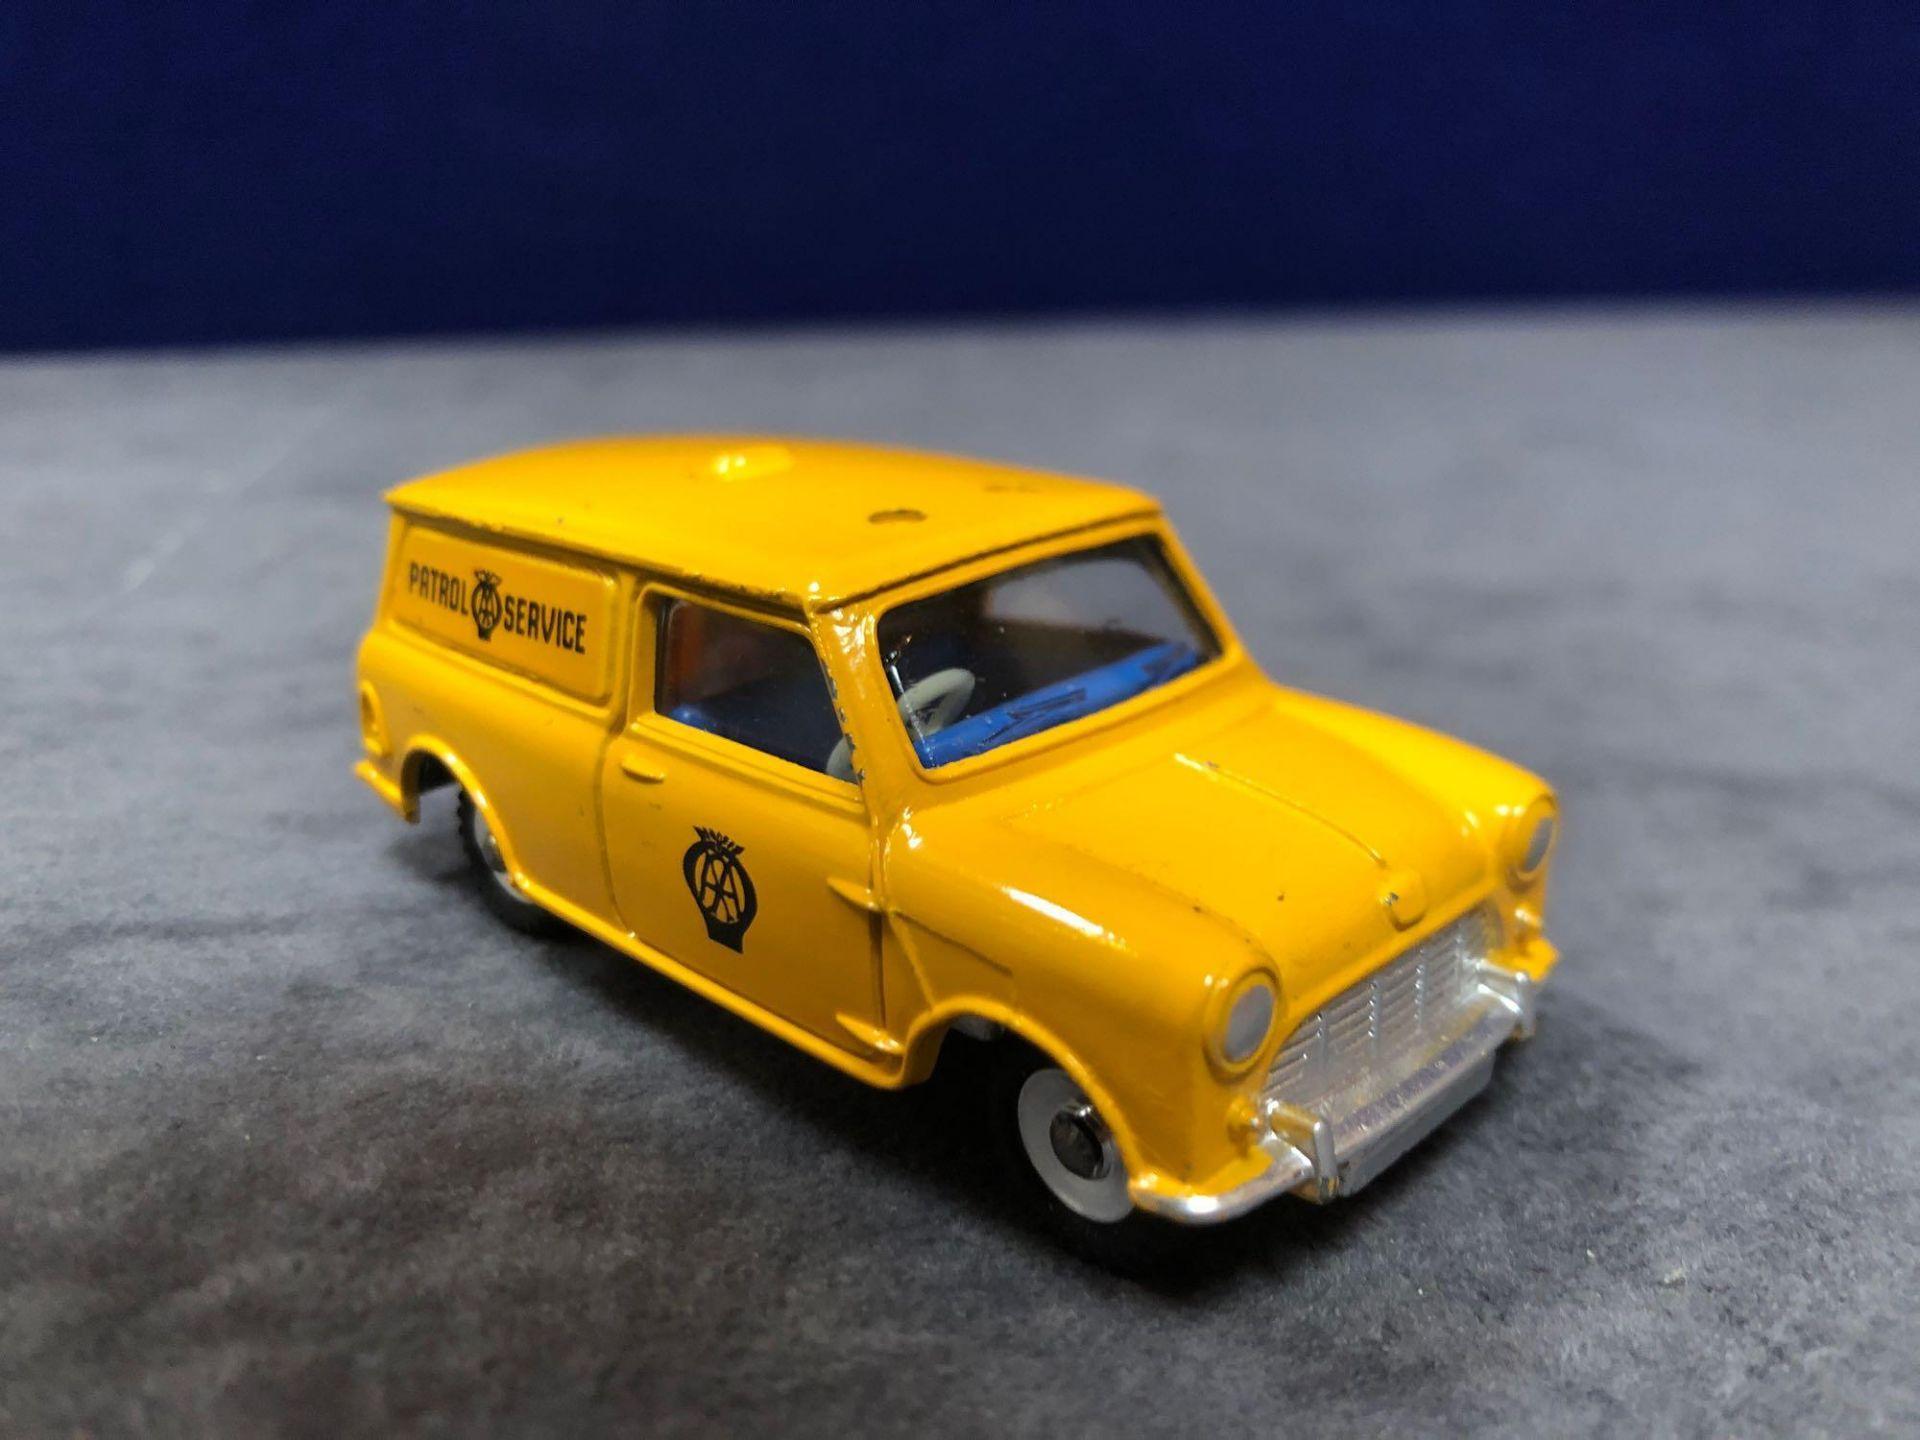 Dinky #274 AA Patrol Mini Van Yellow (AA Service) - Yellow Body And White Roof. AA Service To Van - Image 2 of 4